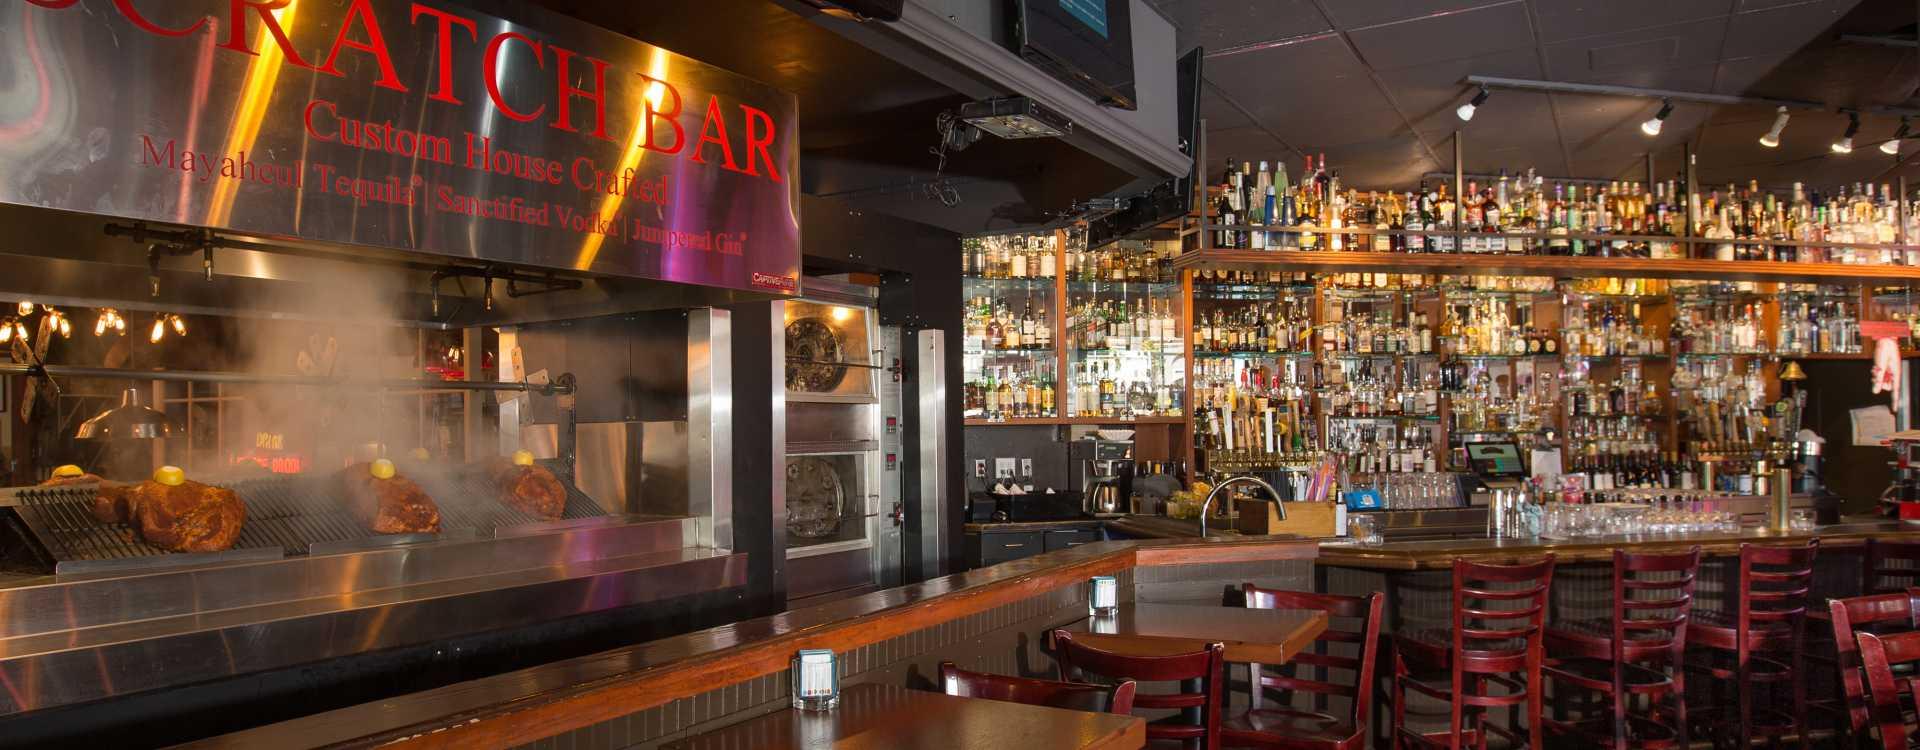 Coast Gateway Hotel Sharps Restaurant